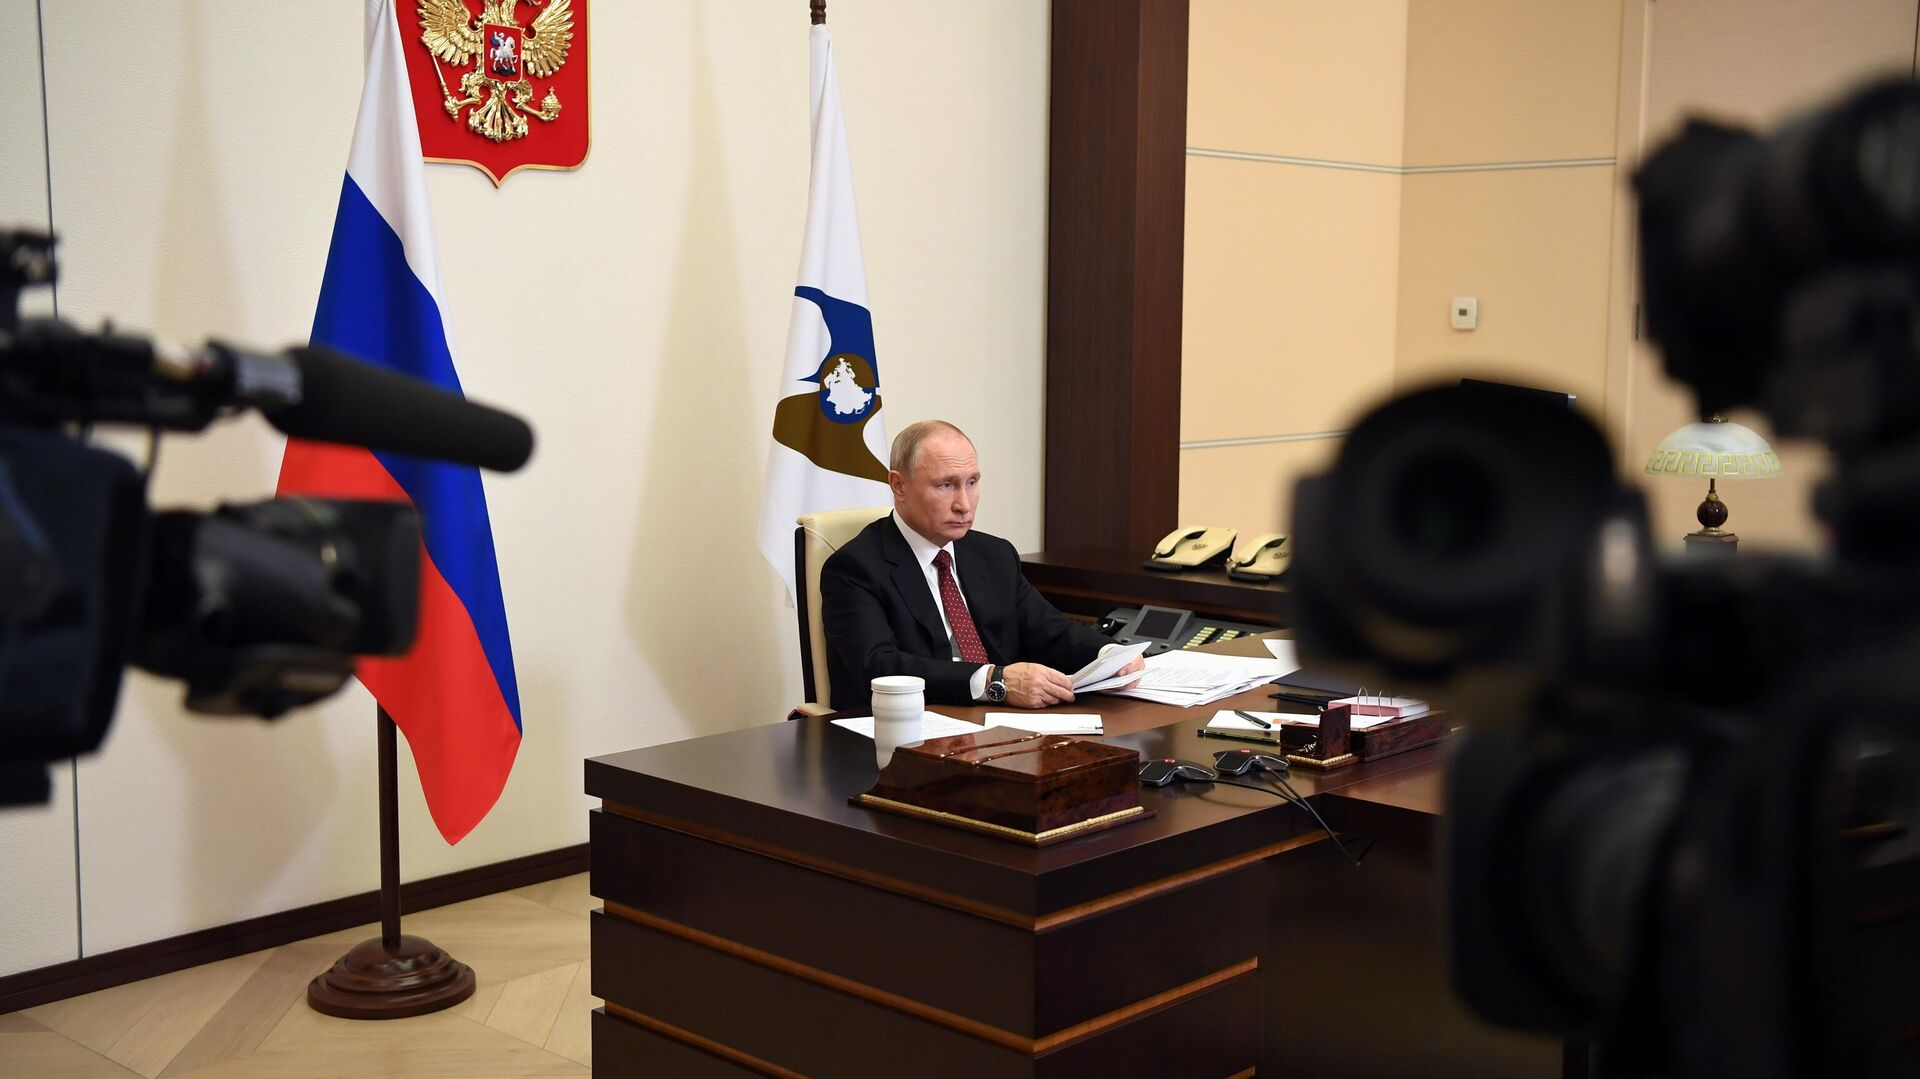 Президент РФ Владимир Путин во время заседания ВЕЭС - РИА Новости, 1920, 11.12.2020